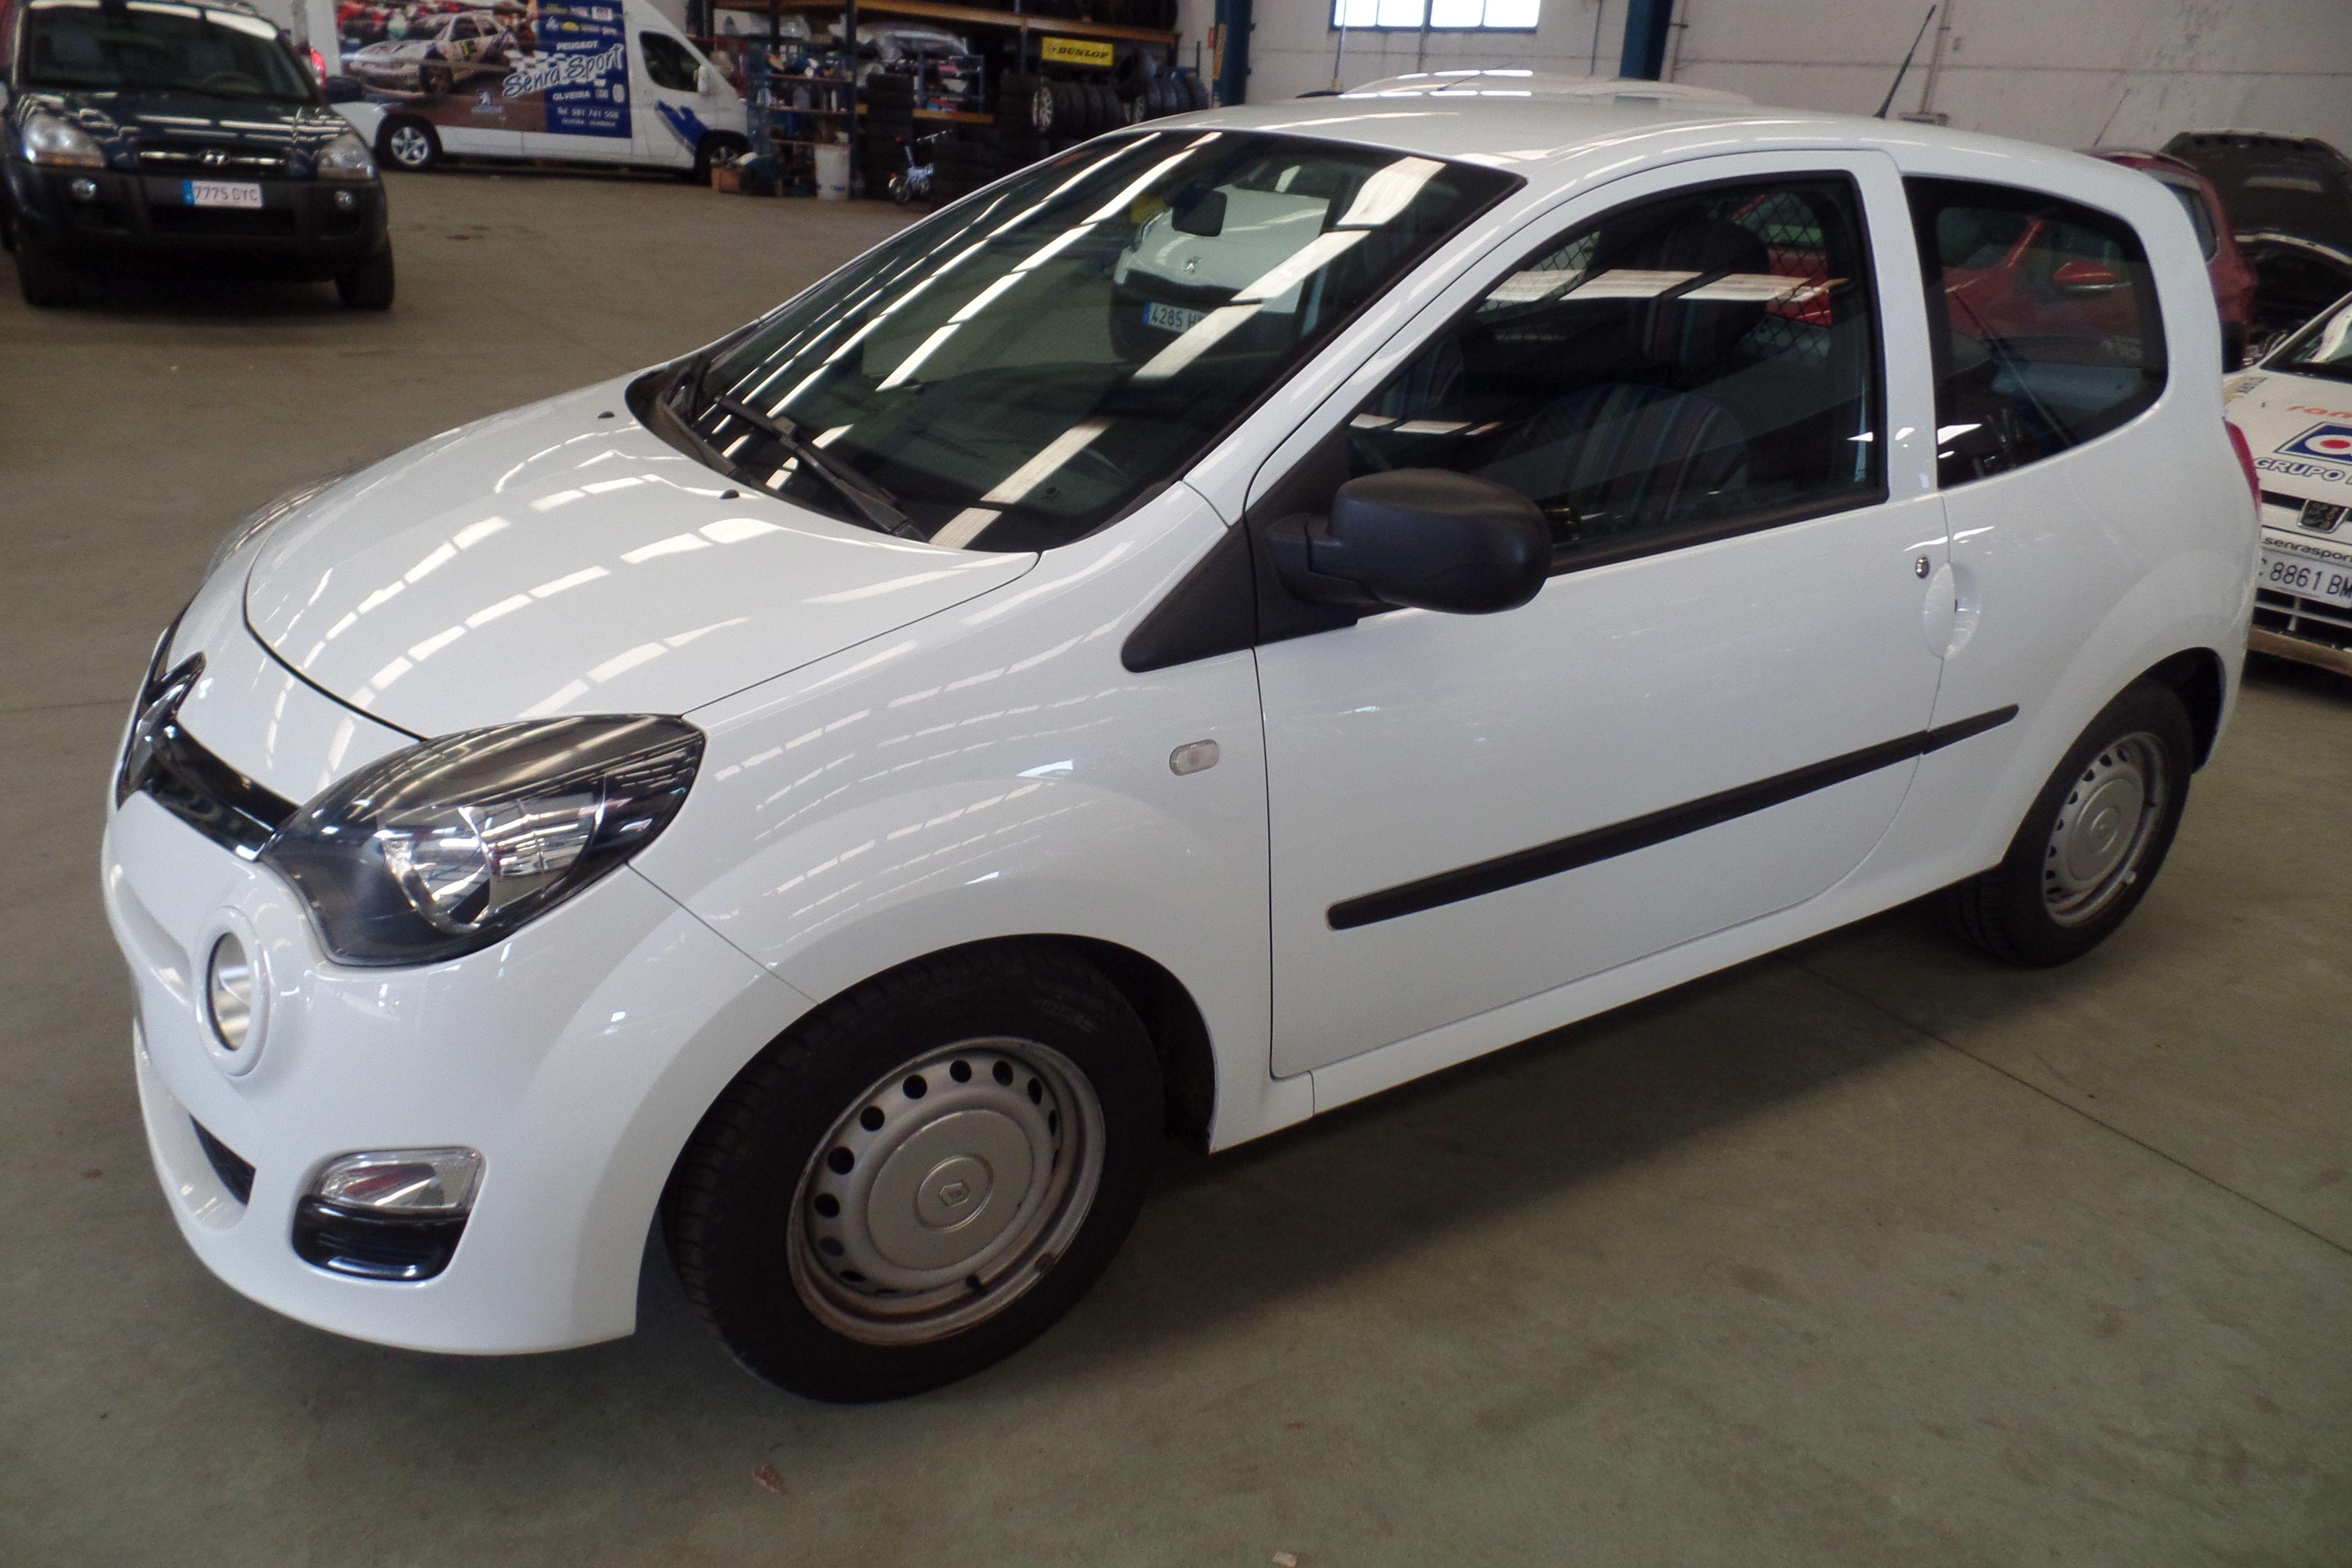 RENAULT Twingo Societe Fase2 dCi 75 E5 (1504-HKN): Servicios Peugeot de Senra Sport